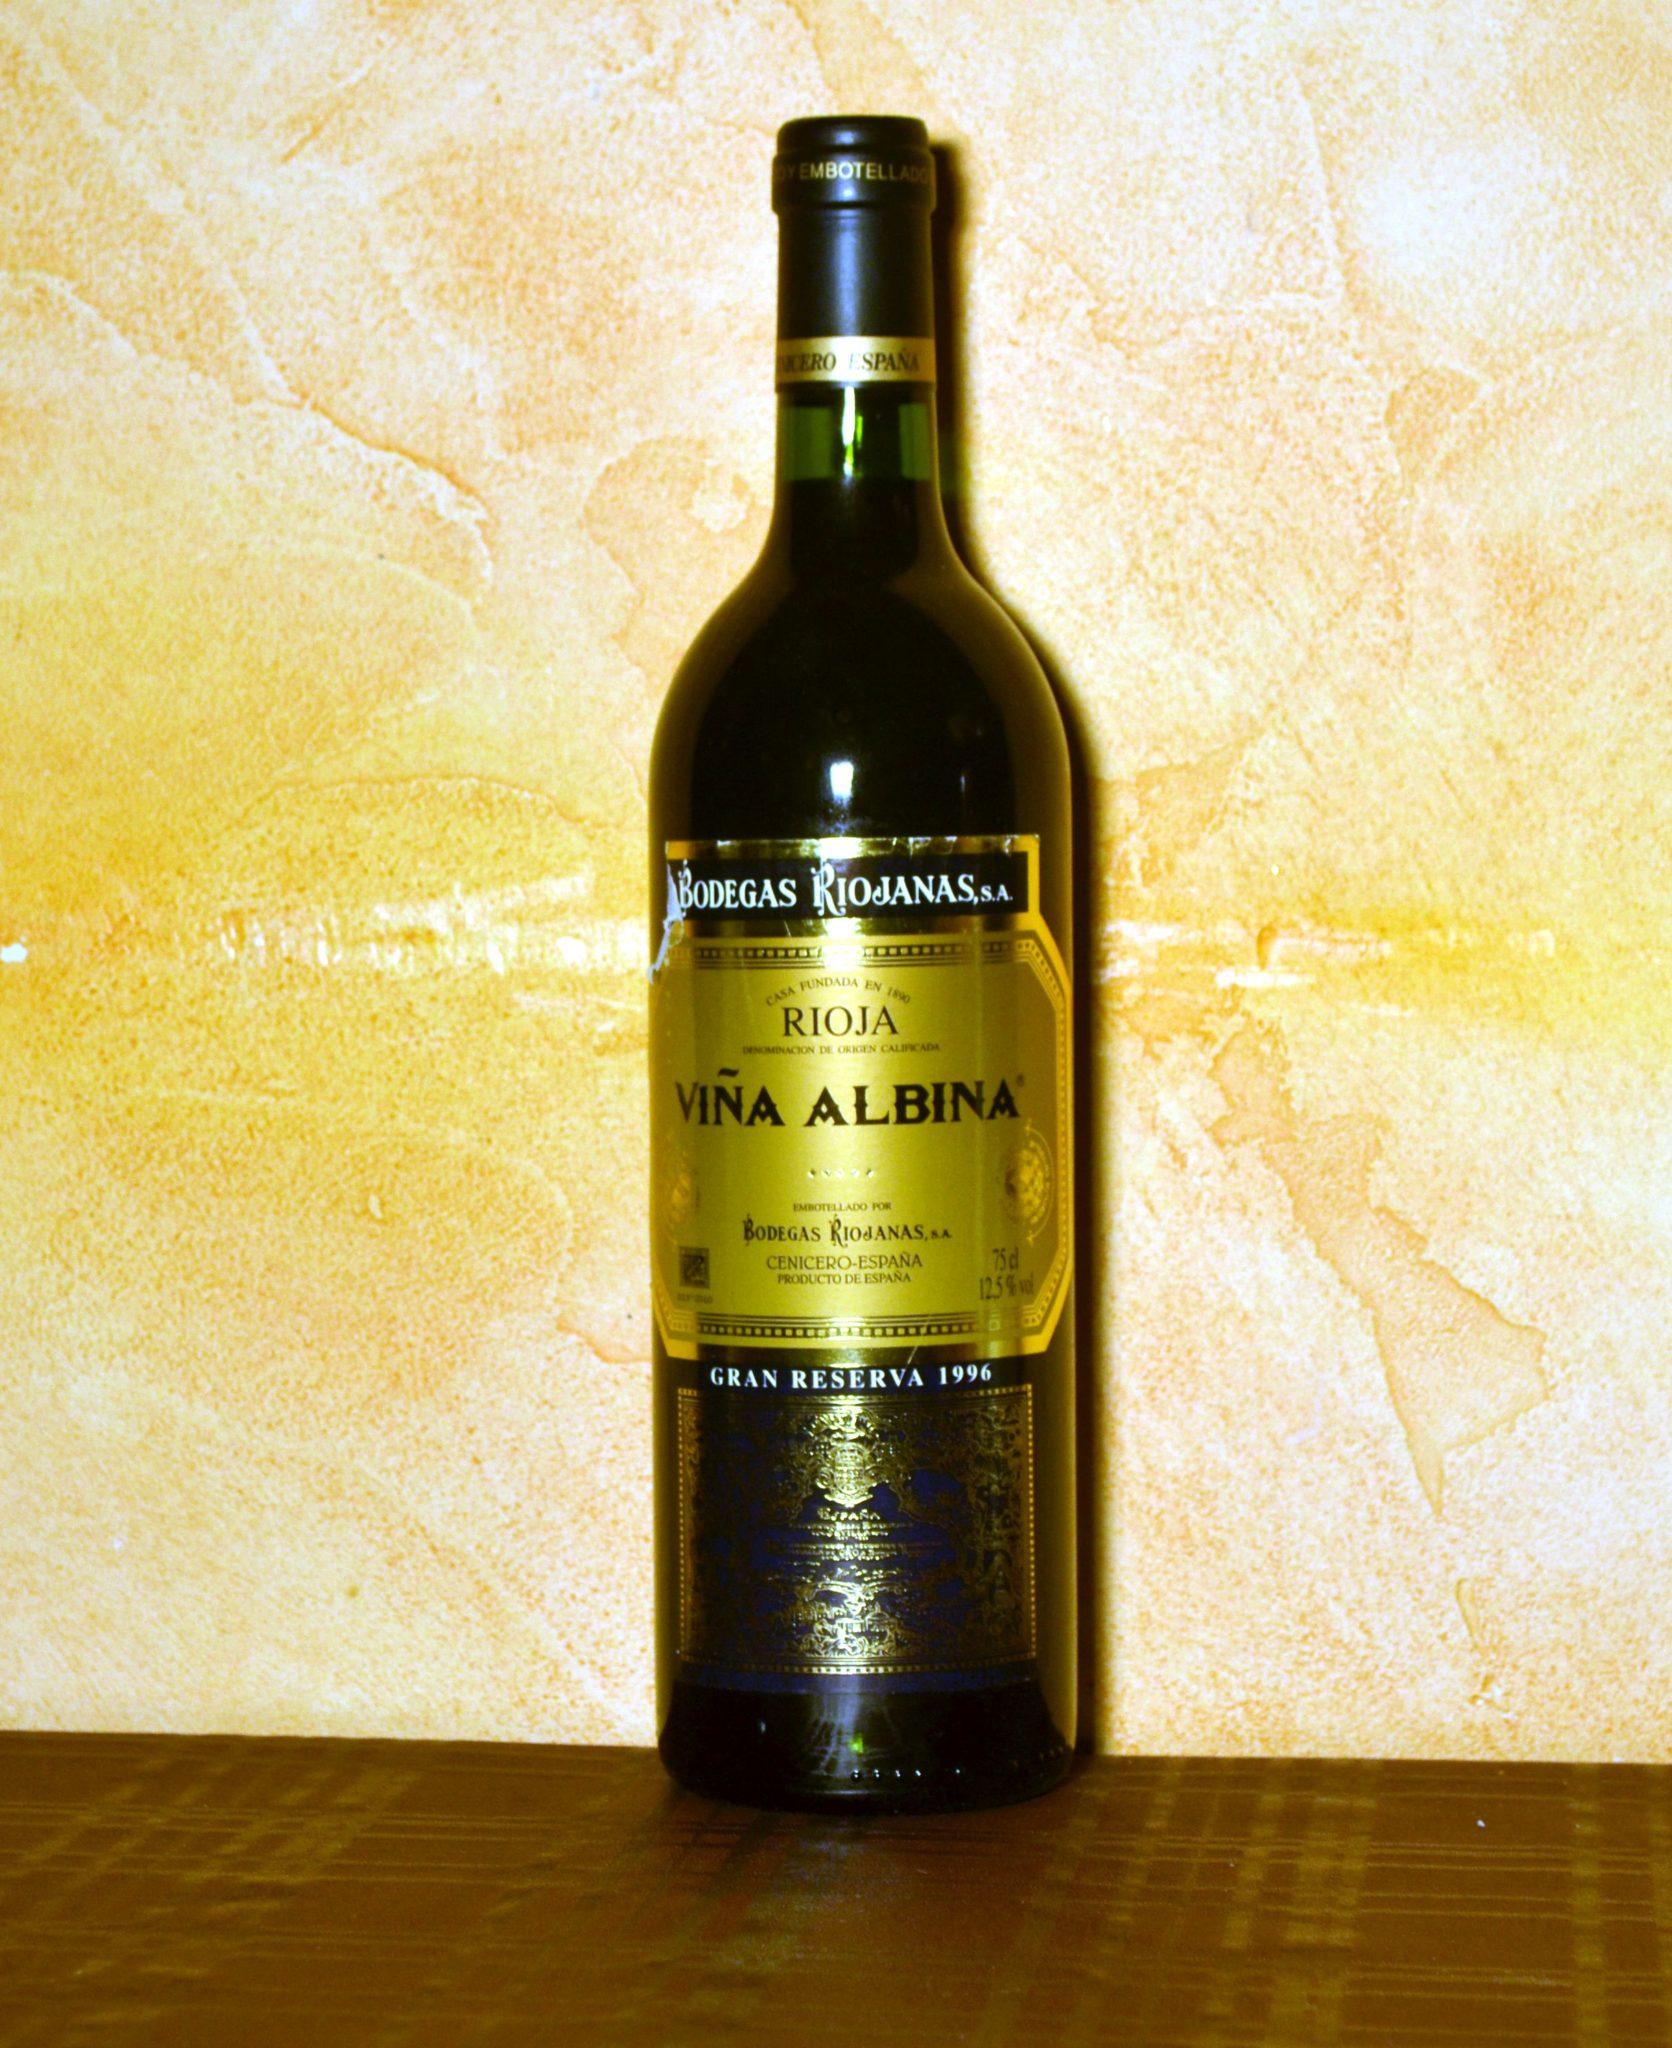 Viña Albina gran reserva 1996